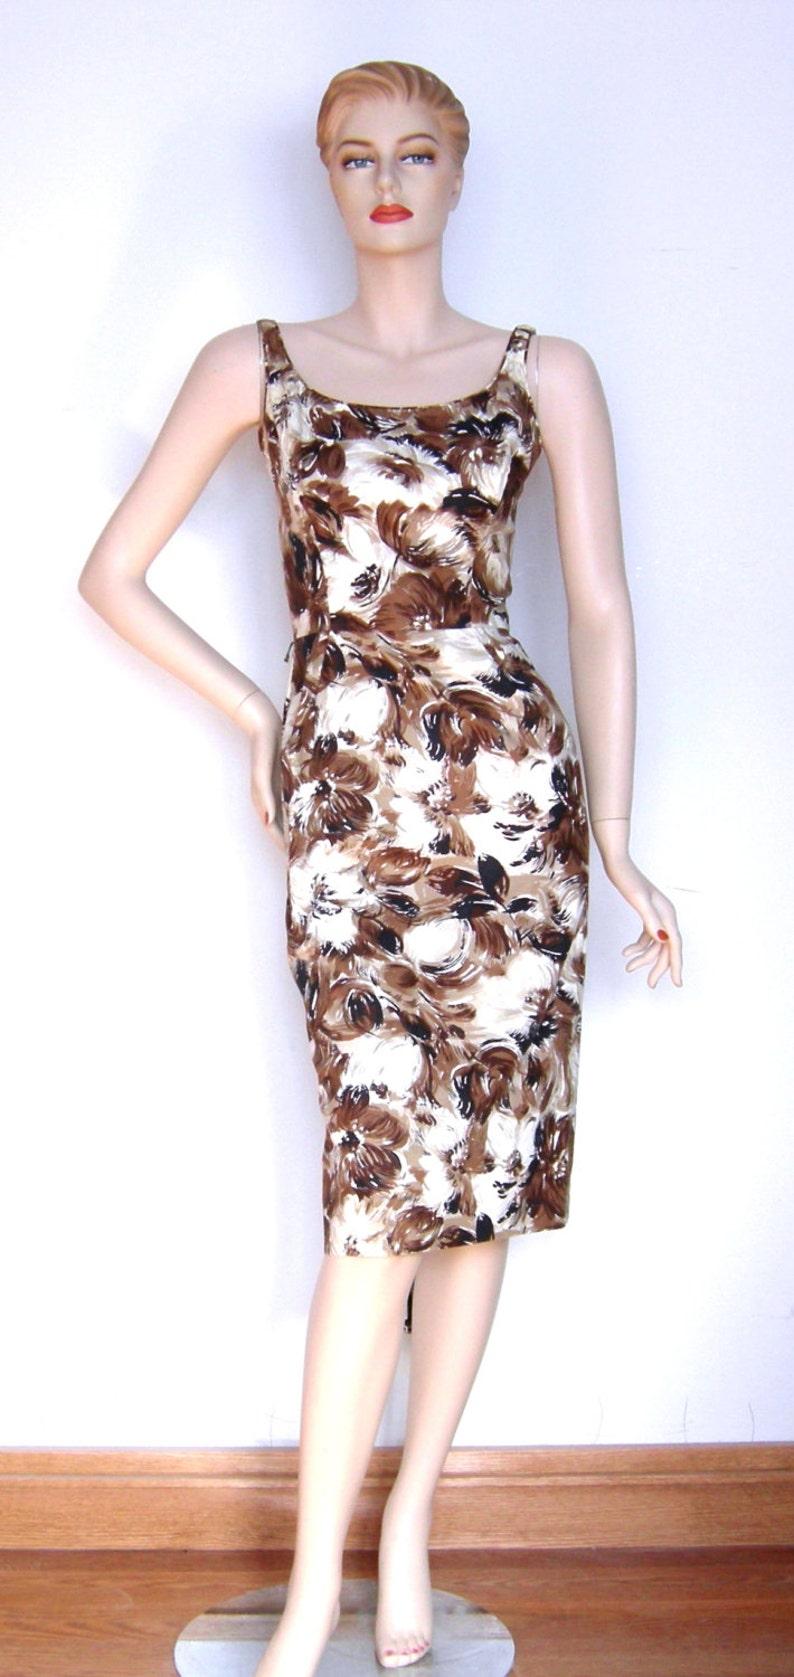 Vintage 1950s Don Loper Dress Duke of Hollywood Couture I Love  5c0b7e8d4